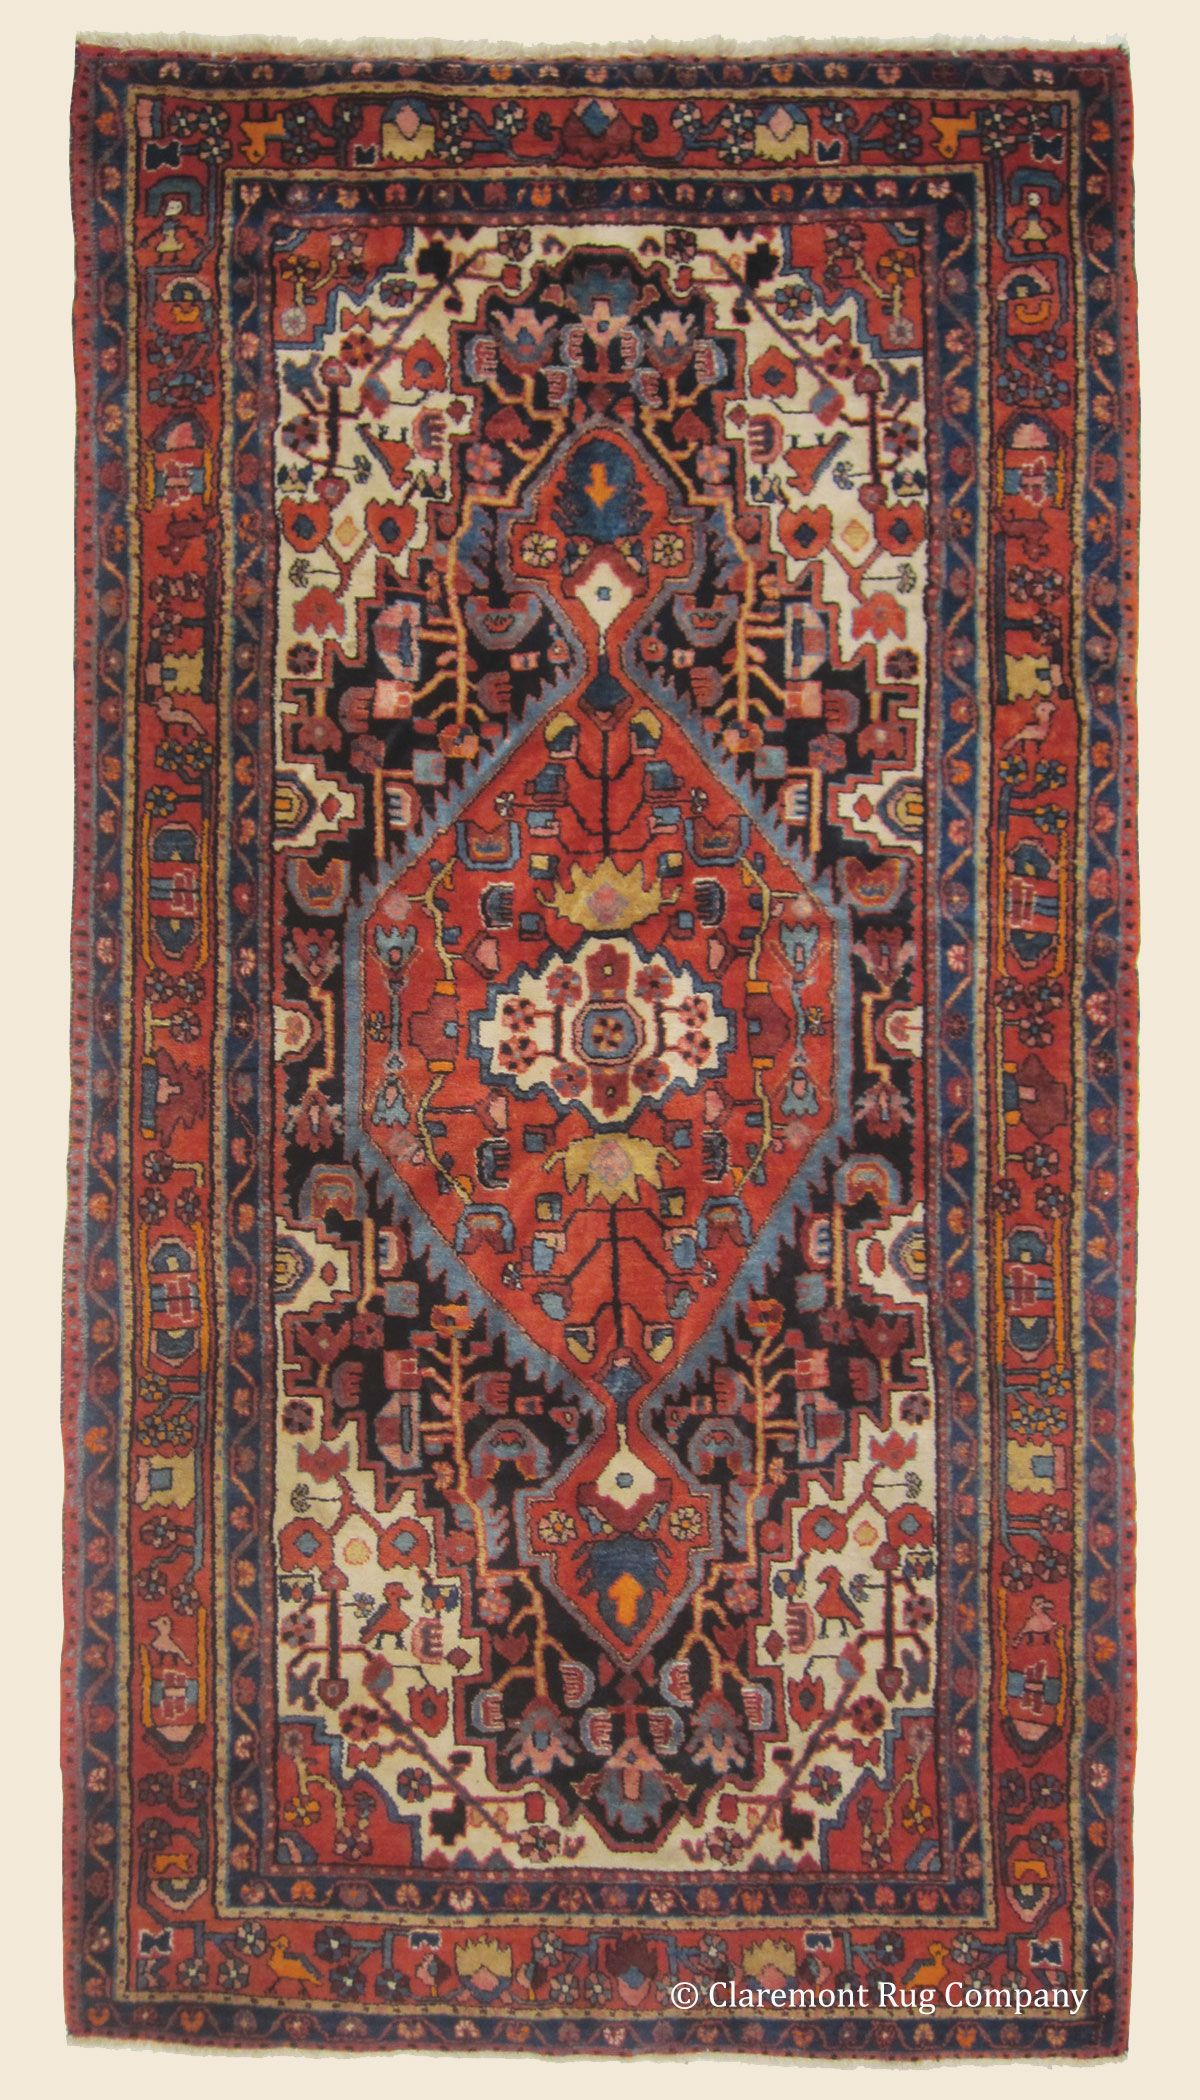 Bakhtiari 5 0 X 9 6 Circa 1950 Price 2 400 Central Persian Antique Rug Claremont Company